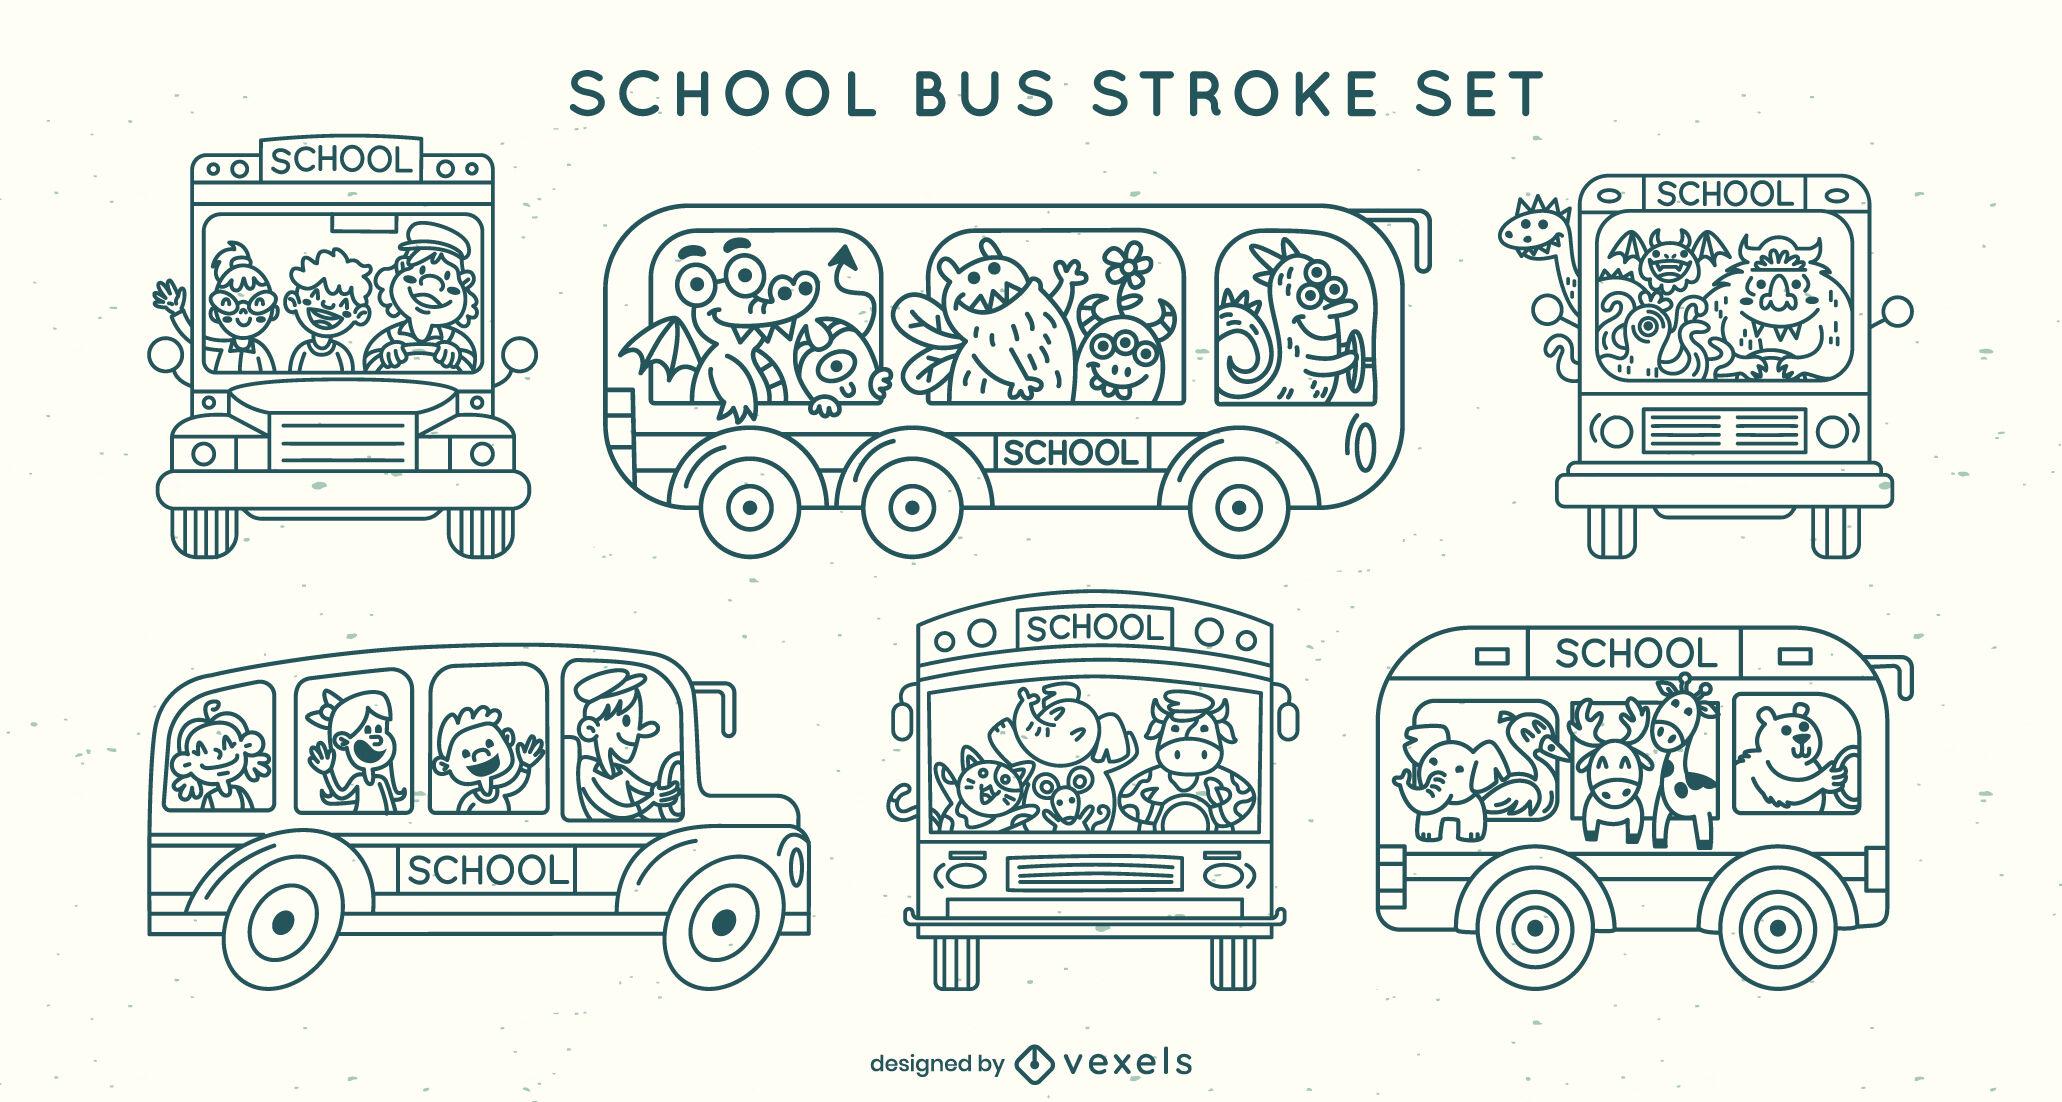 School buses cartoon stroke set